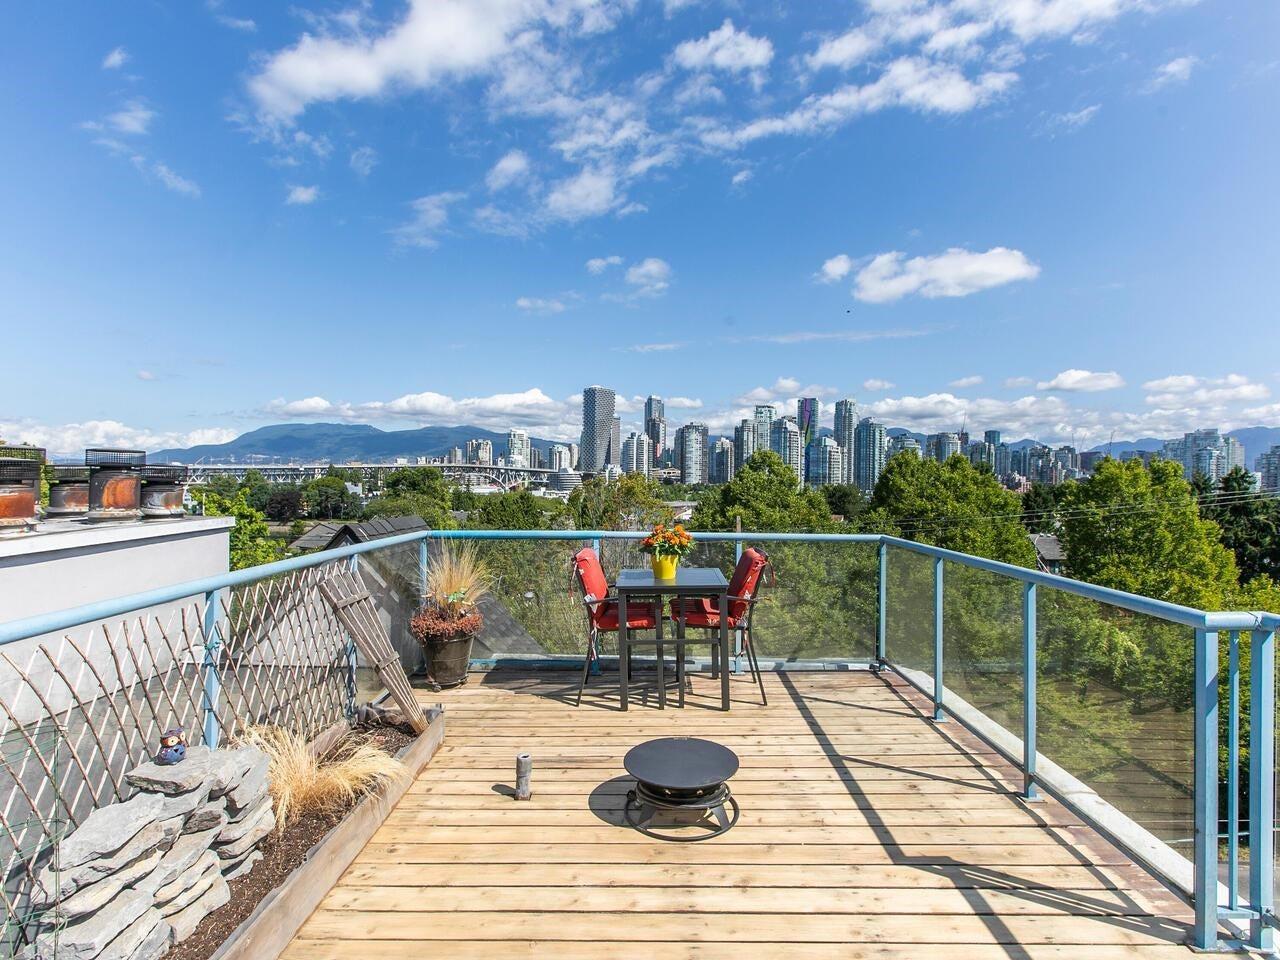 303 1166 W 6TH AVENUE - Fairview VW Apartment/Condo for sale, 1 Bedroom (R2603858)